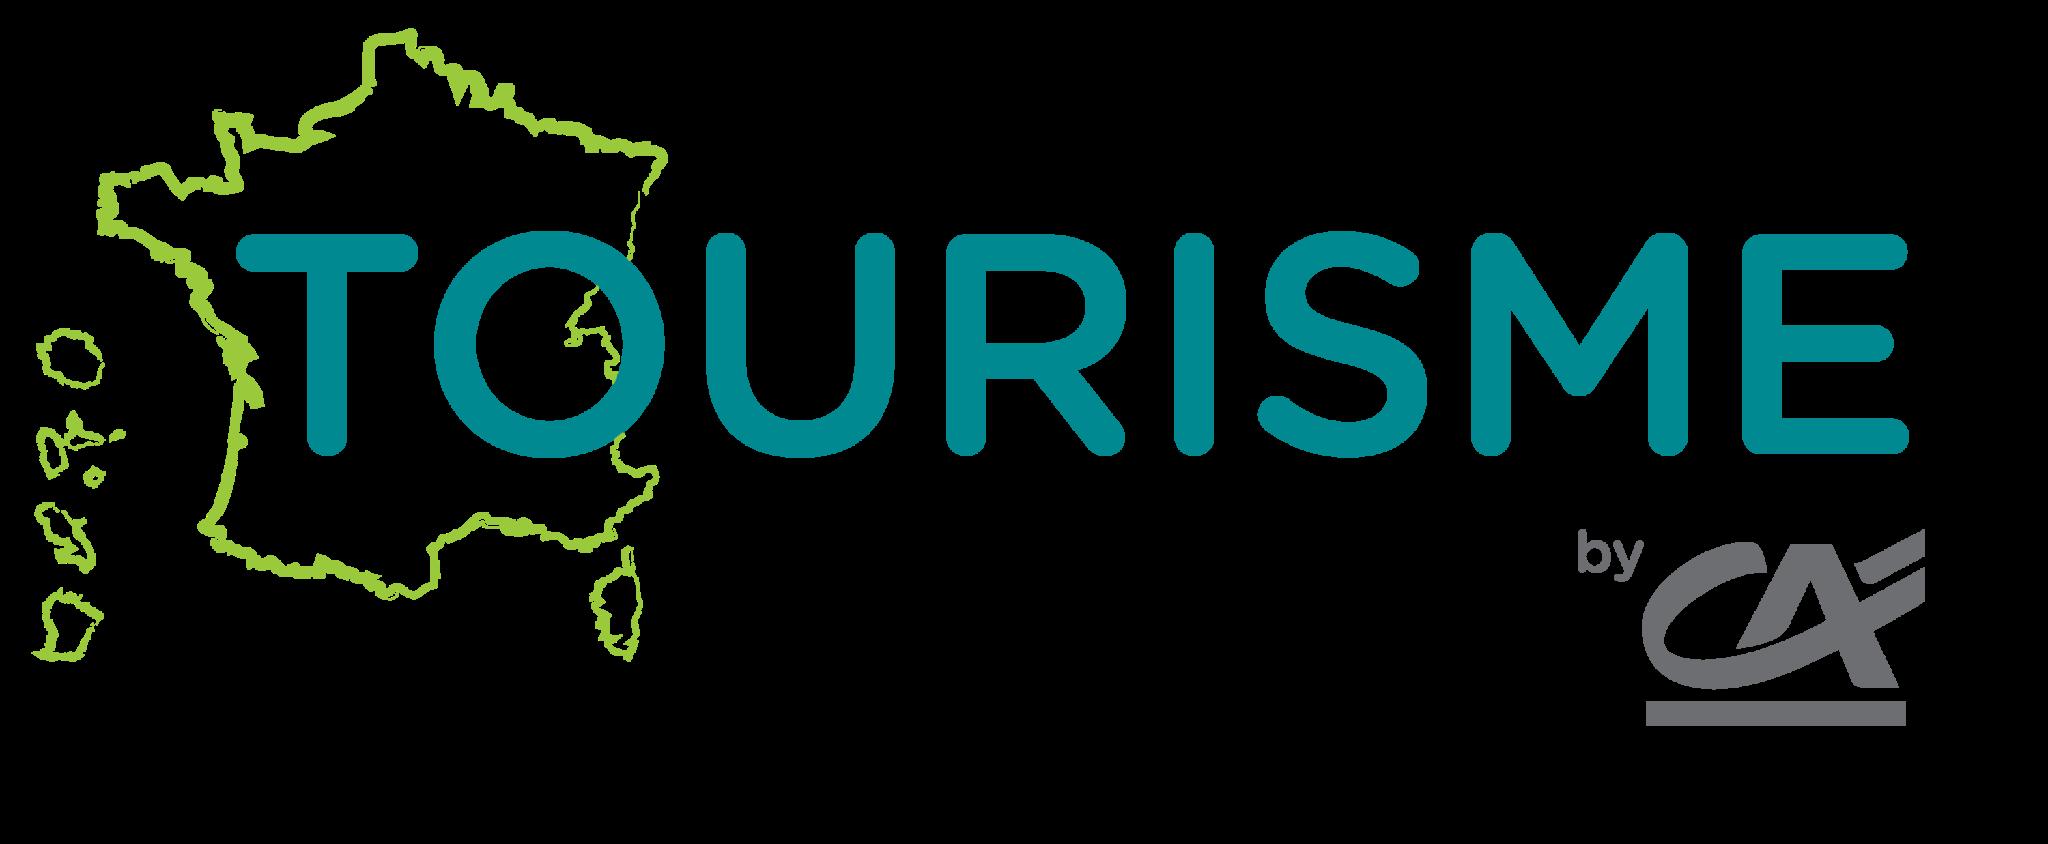 new logo TourismeByCA